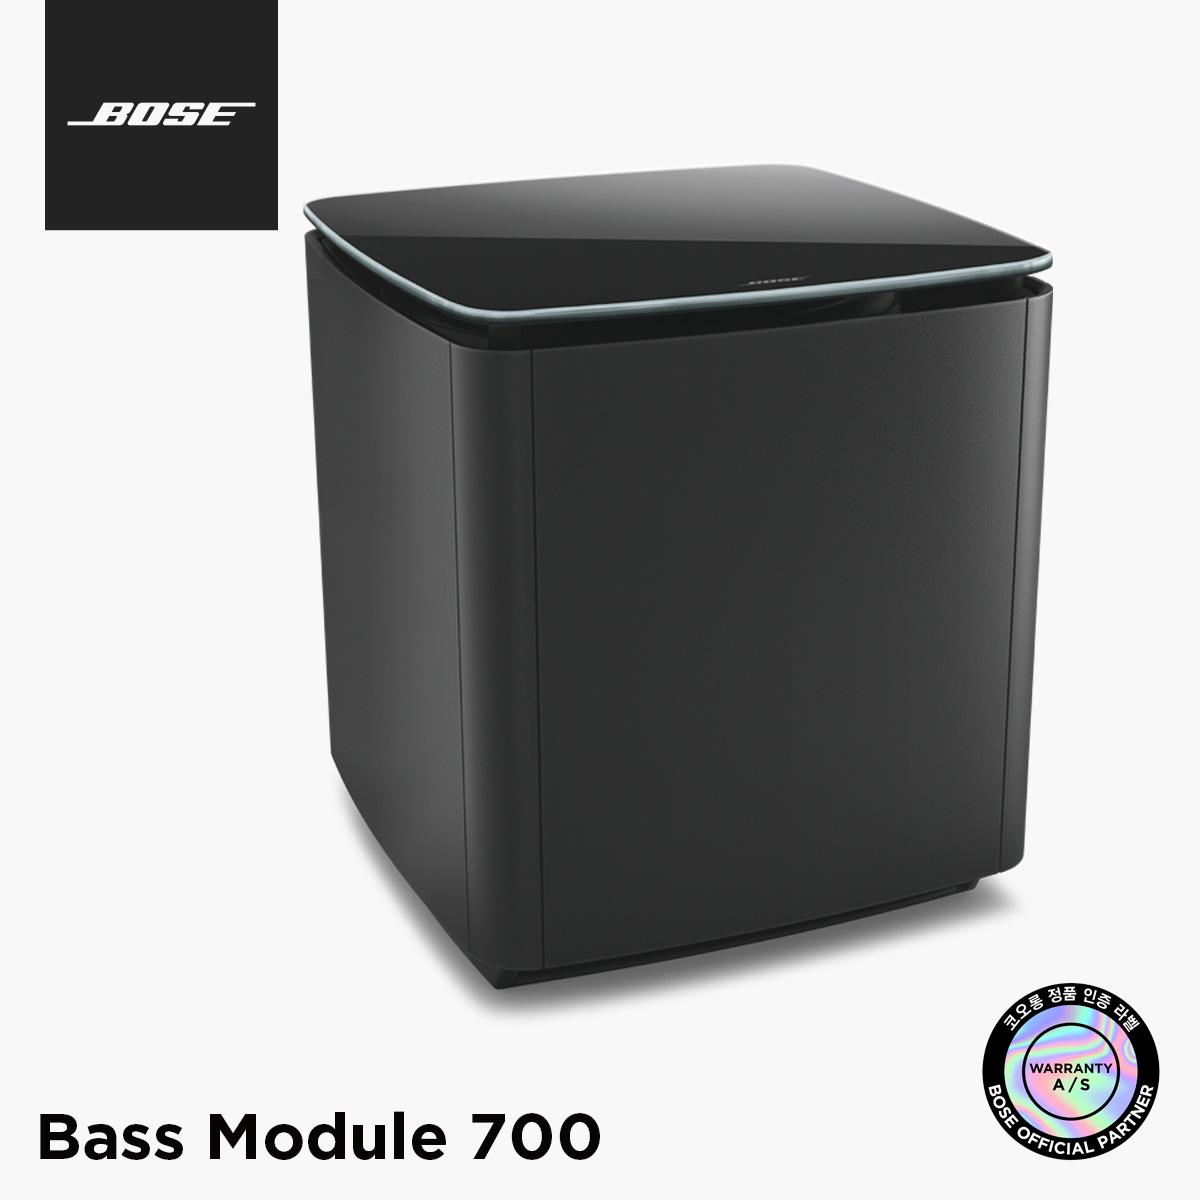 [BOSE] 보스 정품 Bass Module 700 베이스 우퍼 모듈, 블랙